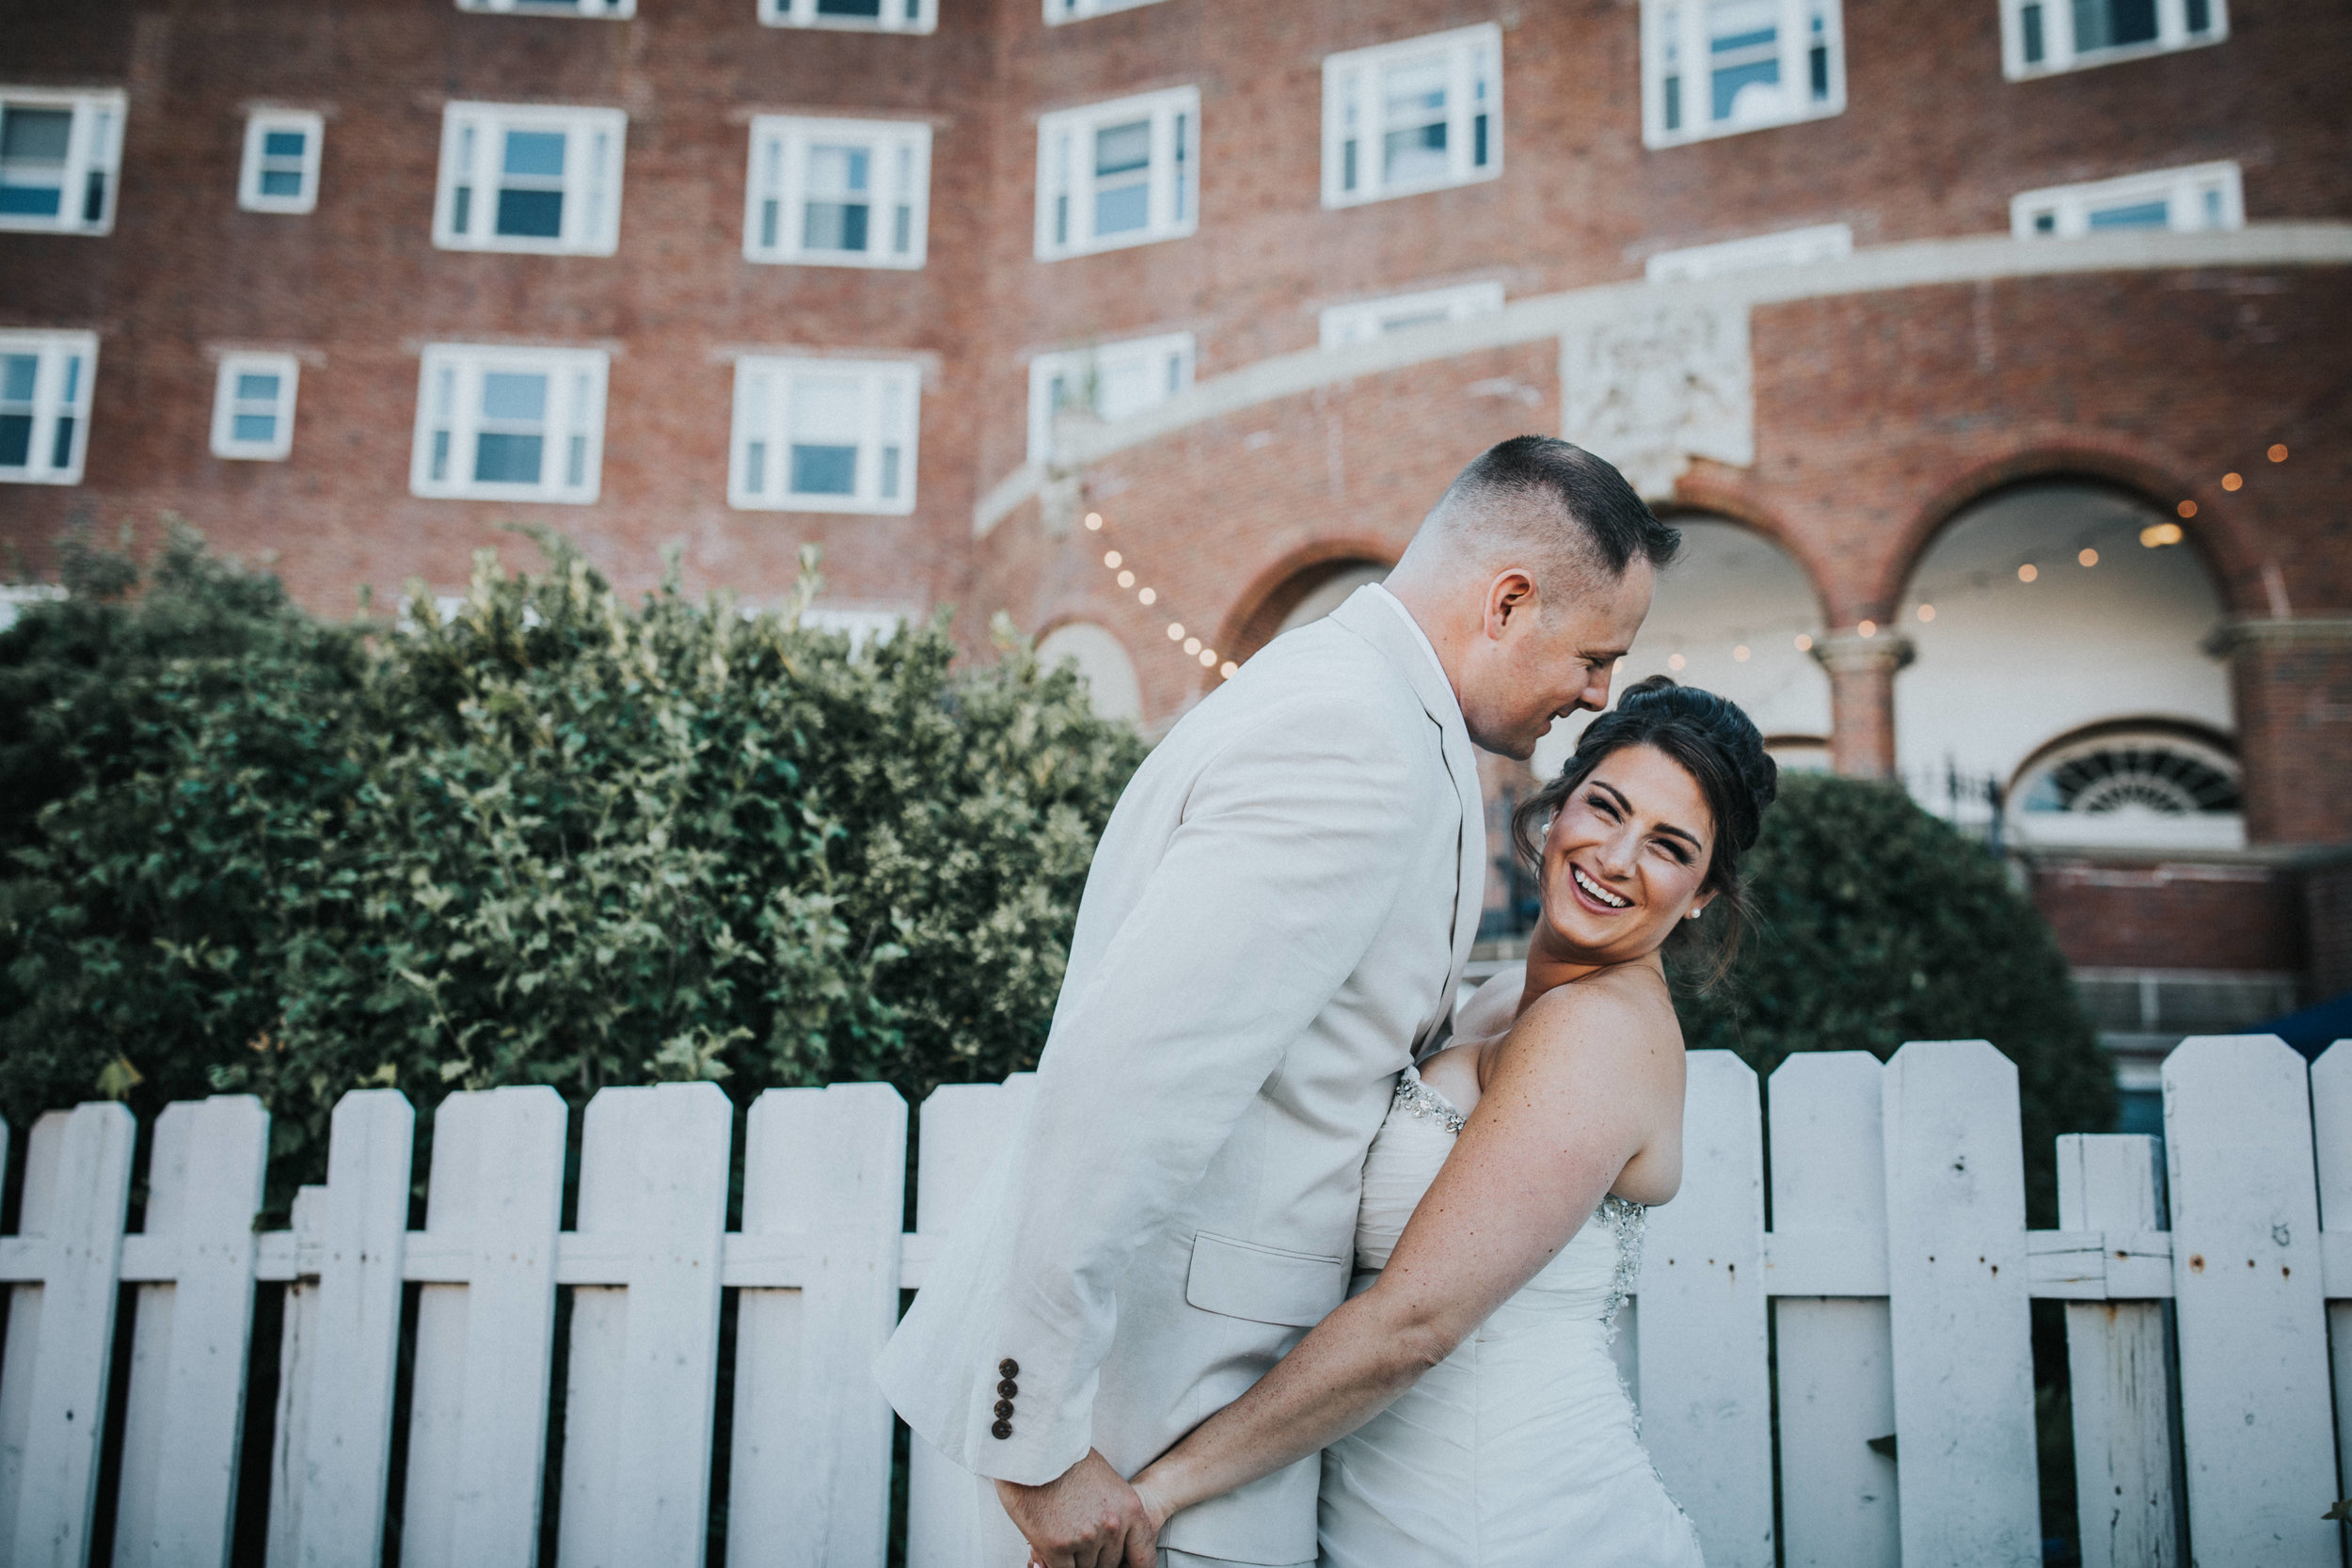 JennaLynnPhotography-NJWeddingPhotographer-Wedding-TheBerkeley-AsburyPark-Allison&Michael-Bride&Groom-42.jpg